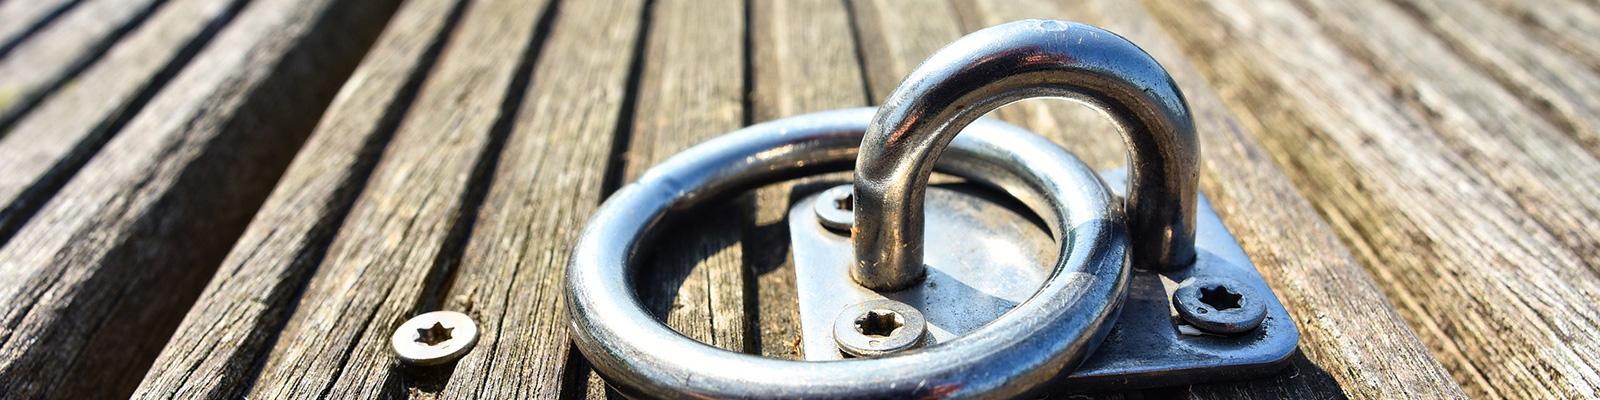 Bolt lock on dock